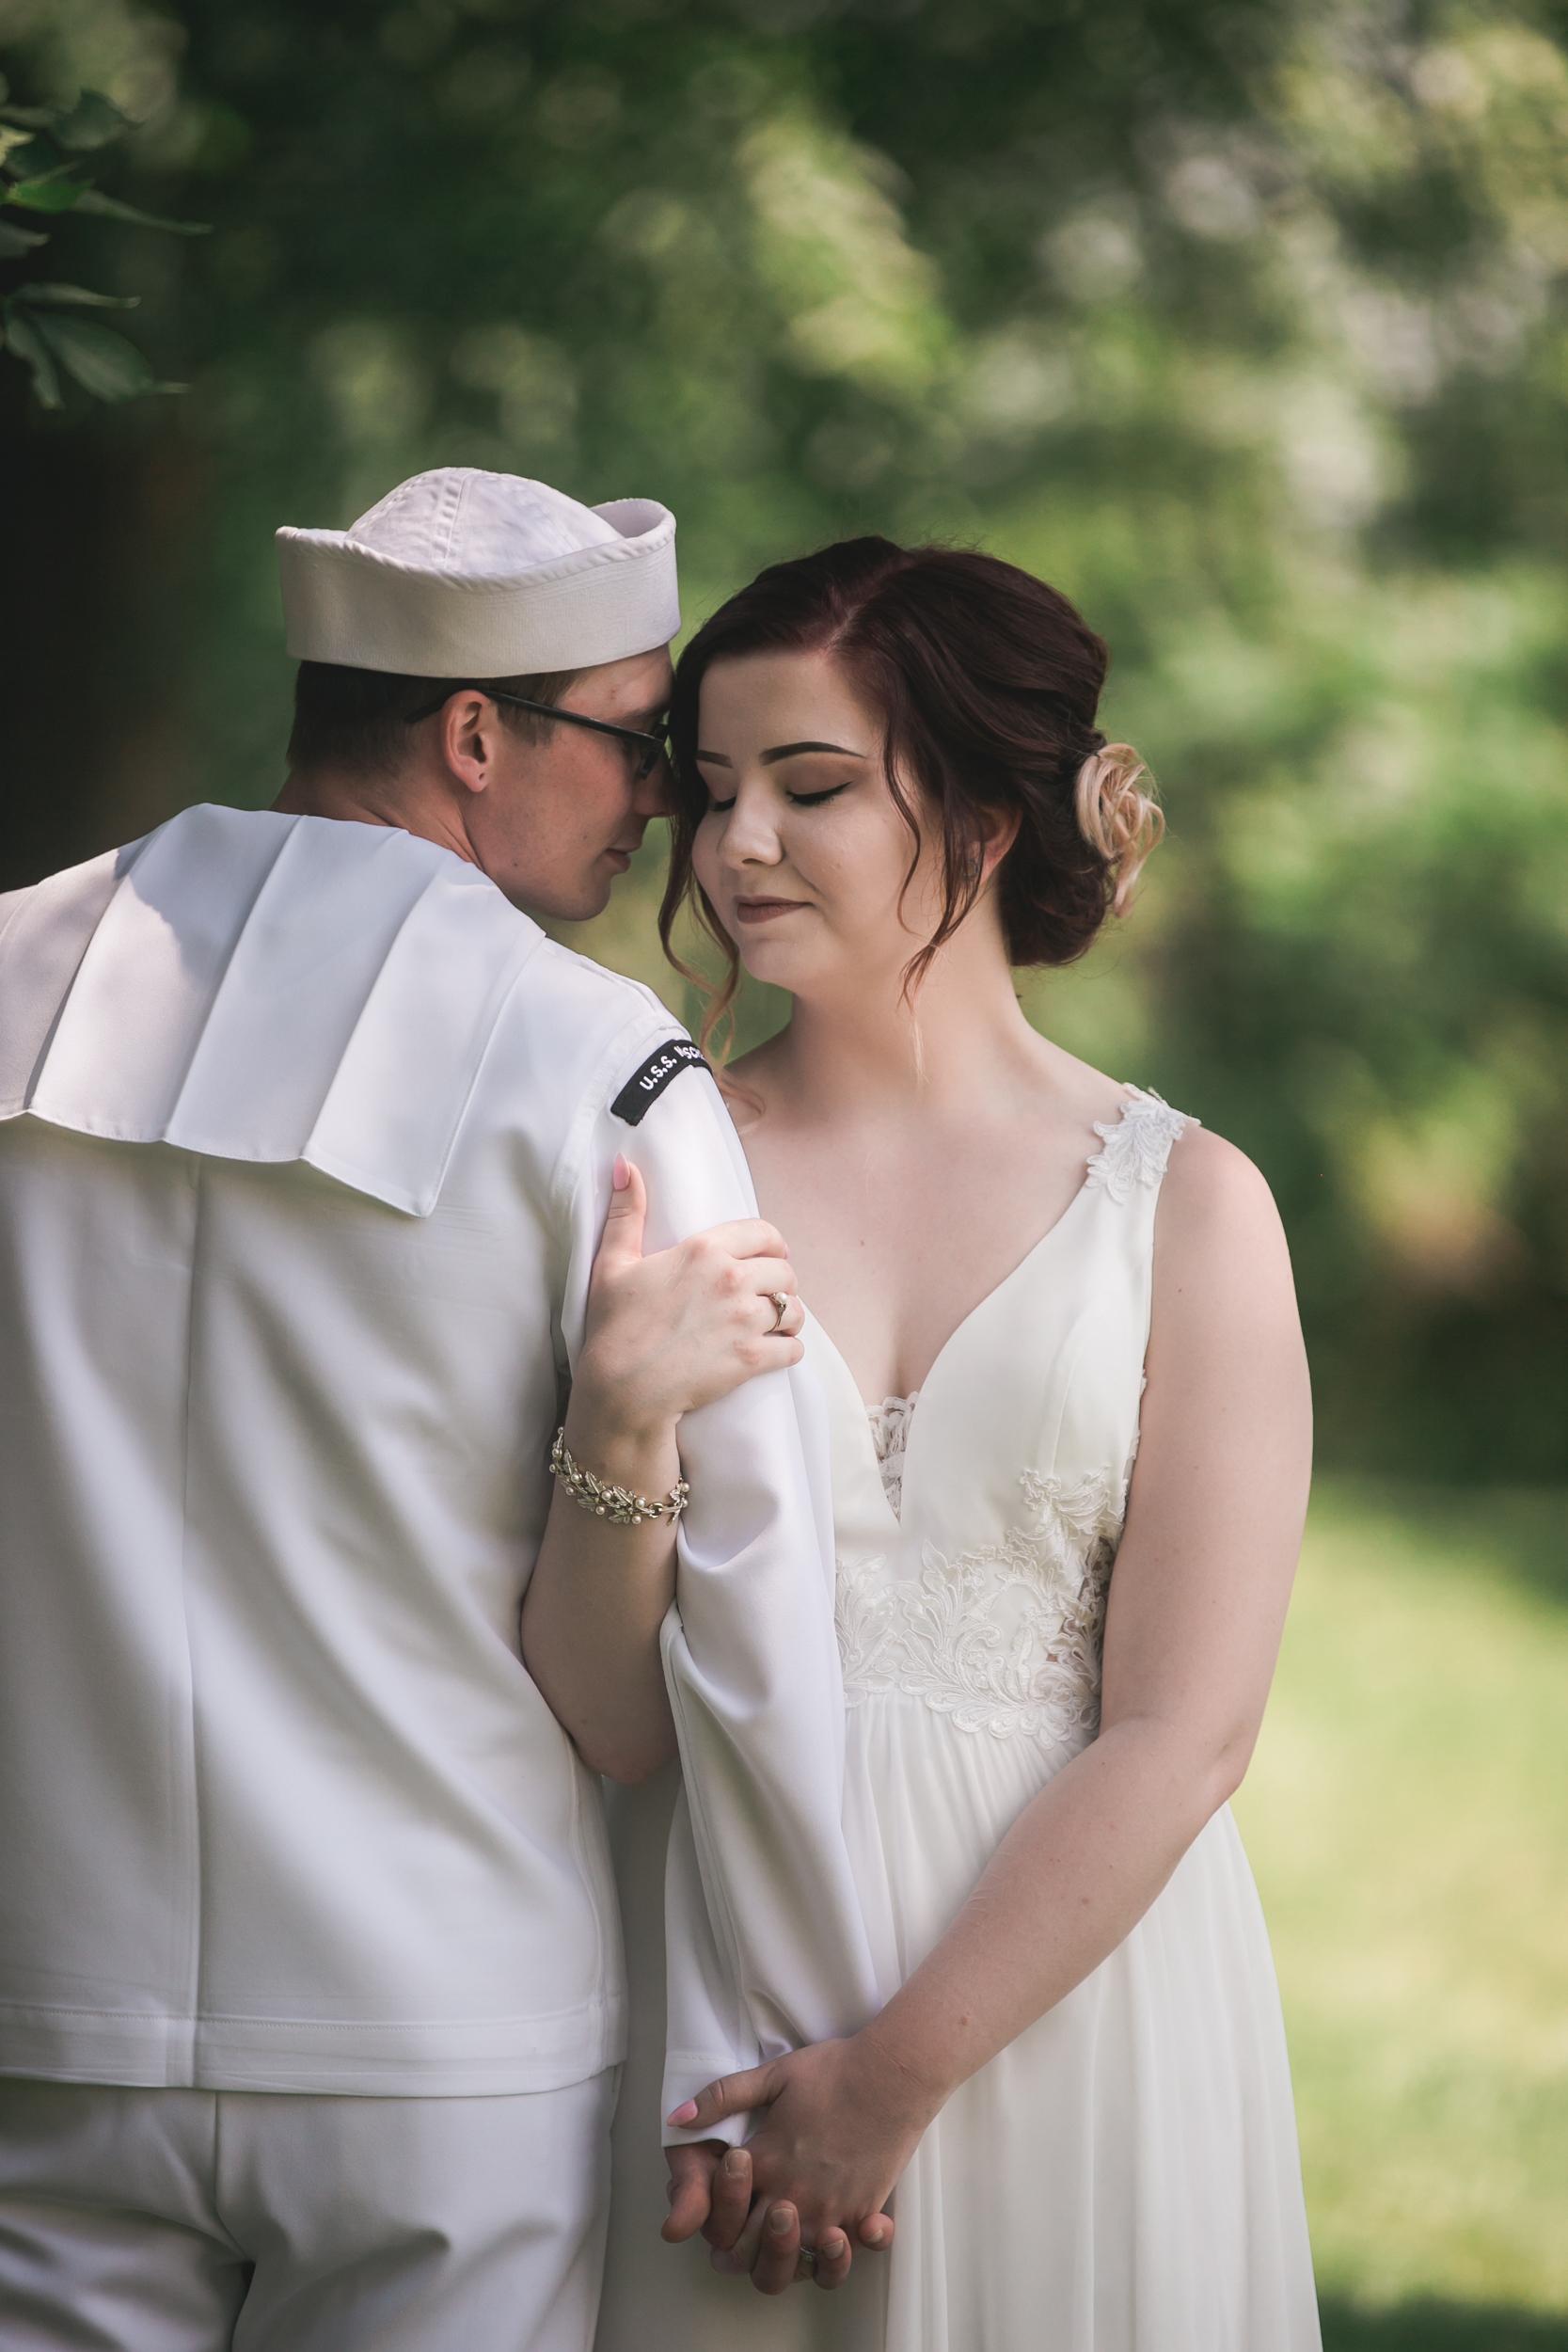 intimate elopement wedding, duluth mn, duluth mn elopement wedding, -www.rachelsmak.com19.jpg